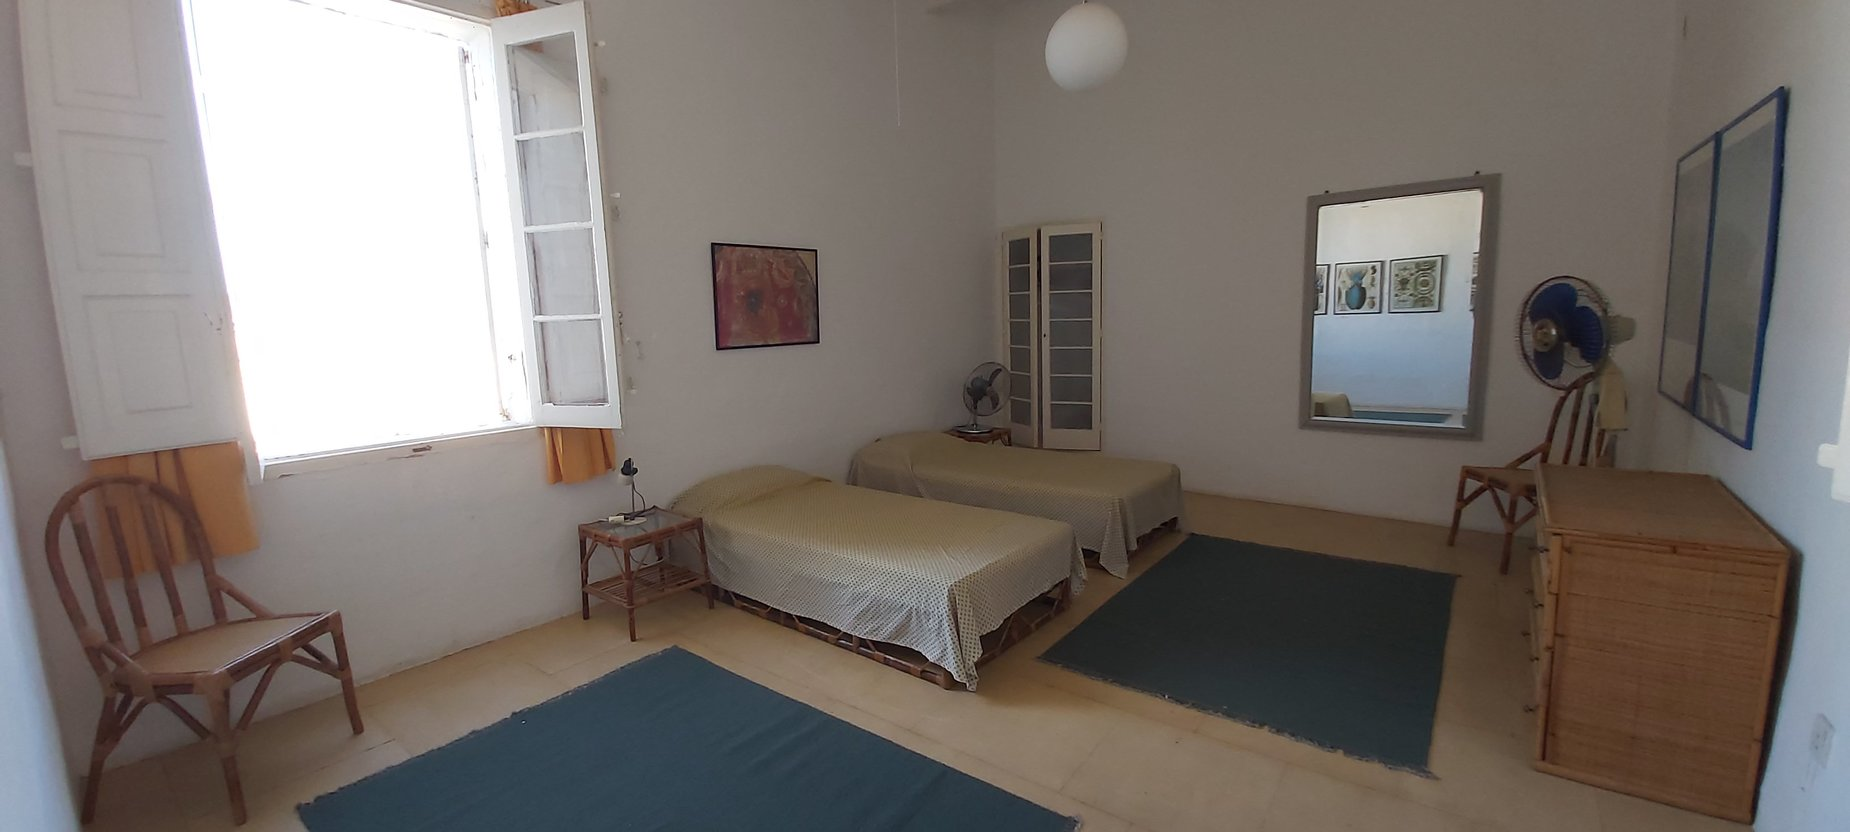 5 bed Town House For Sale in Lija, Lija - thumb 20